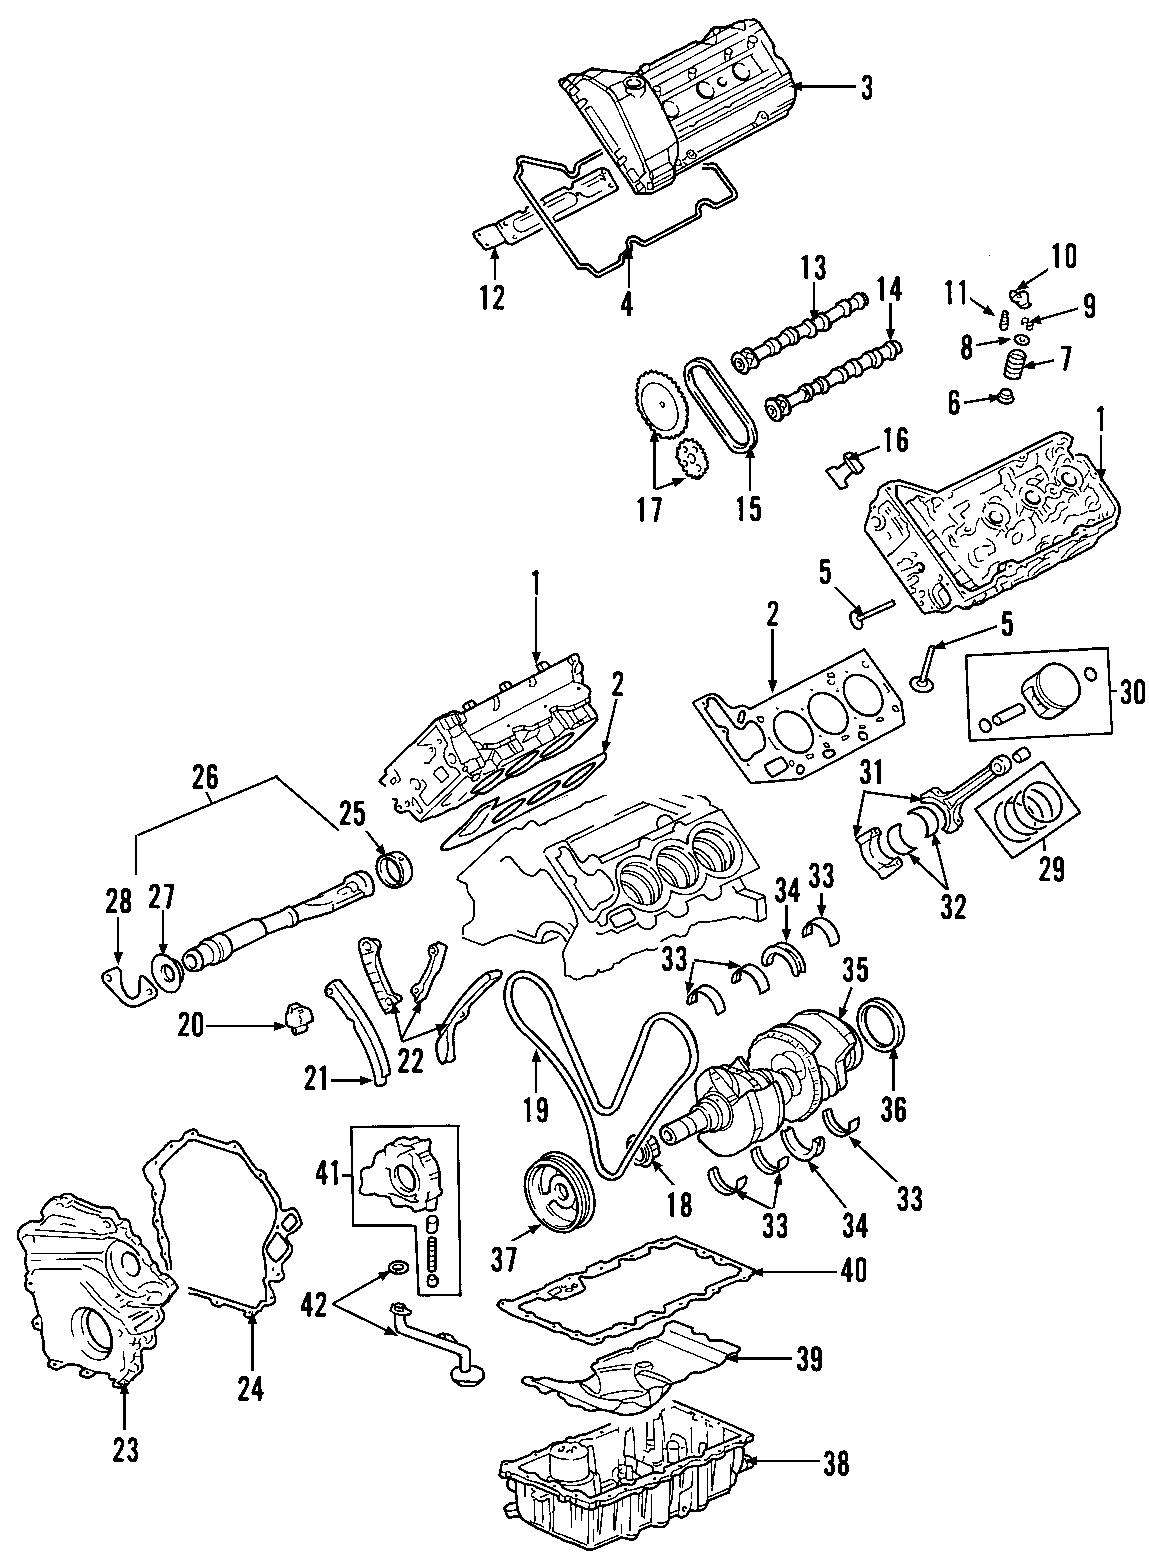 Oldsmobile Aurora Engine Valve Spring Retainer Keeper